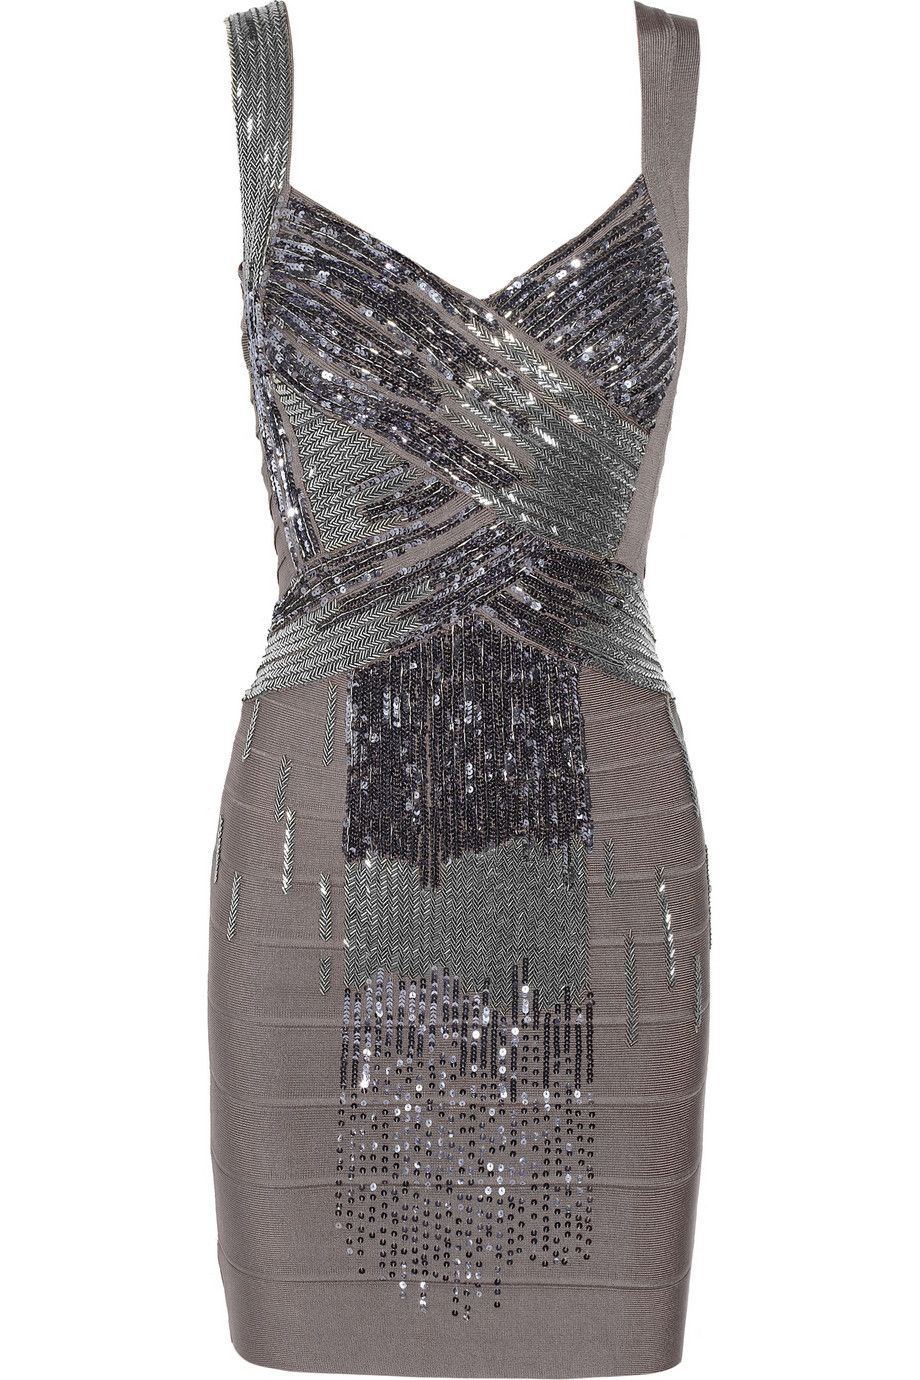 Embellished bandage dress by hervé léger x aniversario glamour